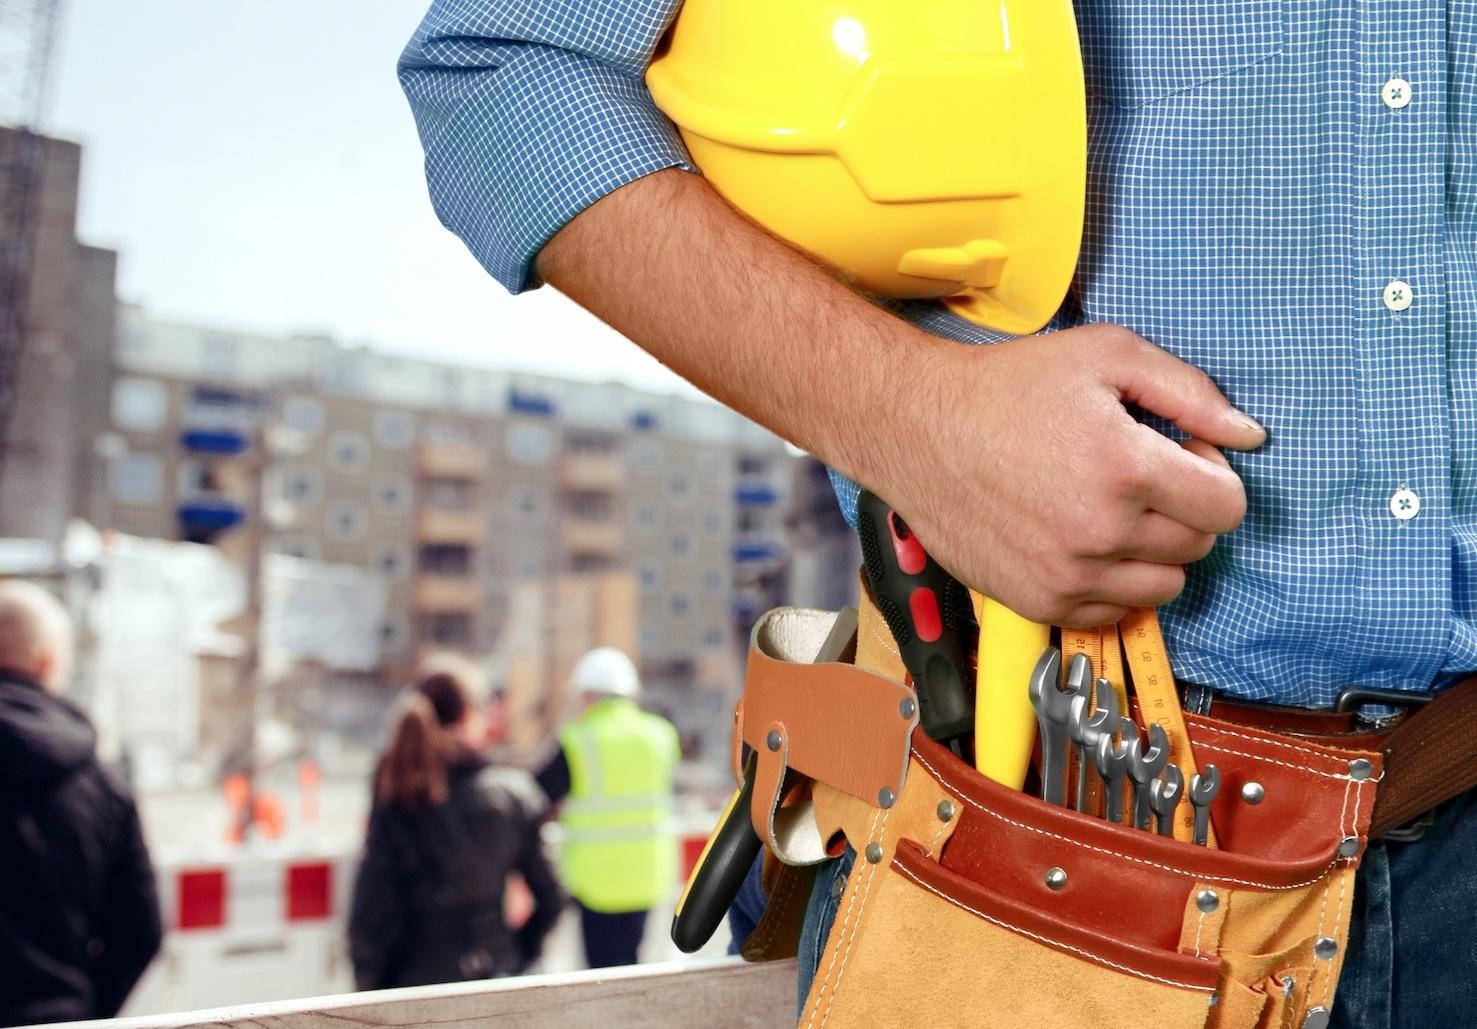 best handyman services in Phoenix az, www.yourphoenixhandyman.com